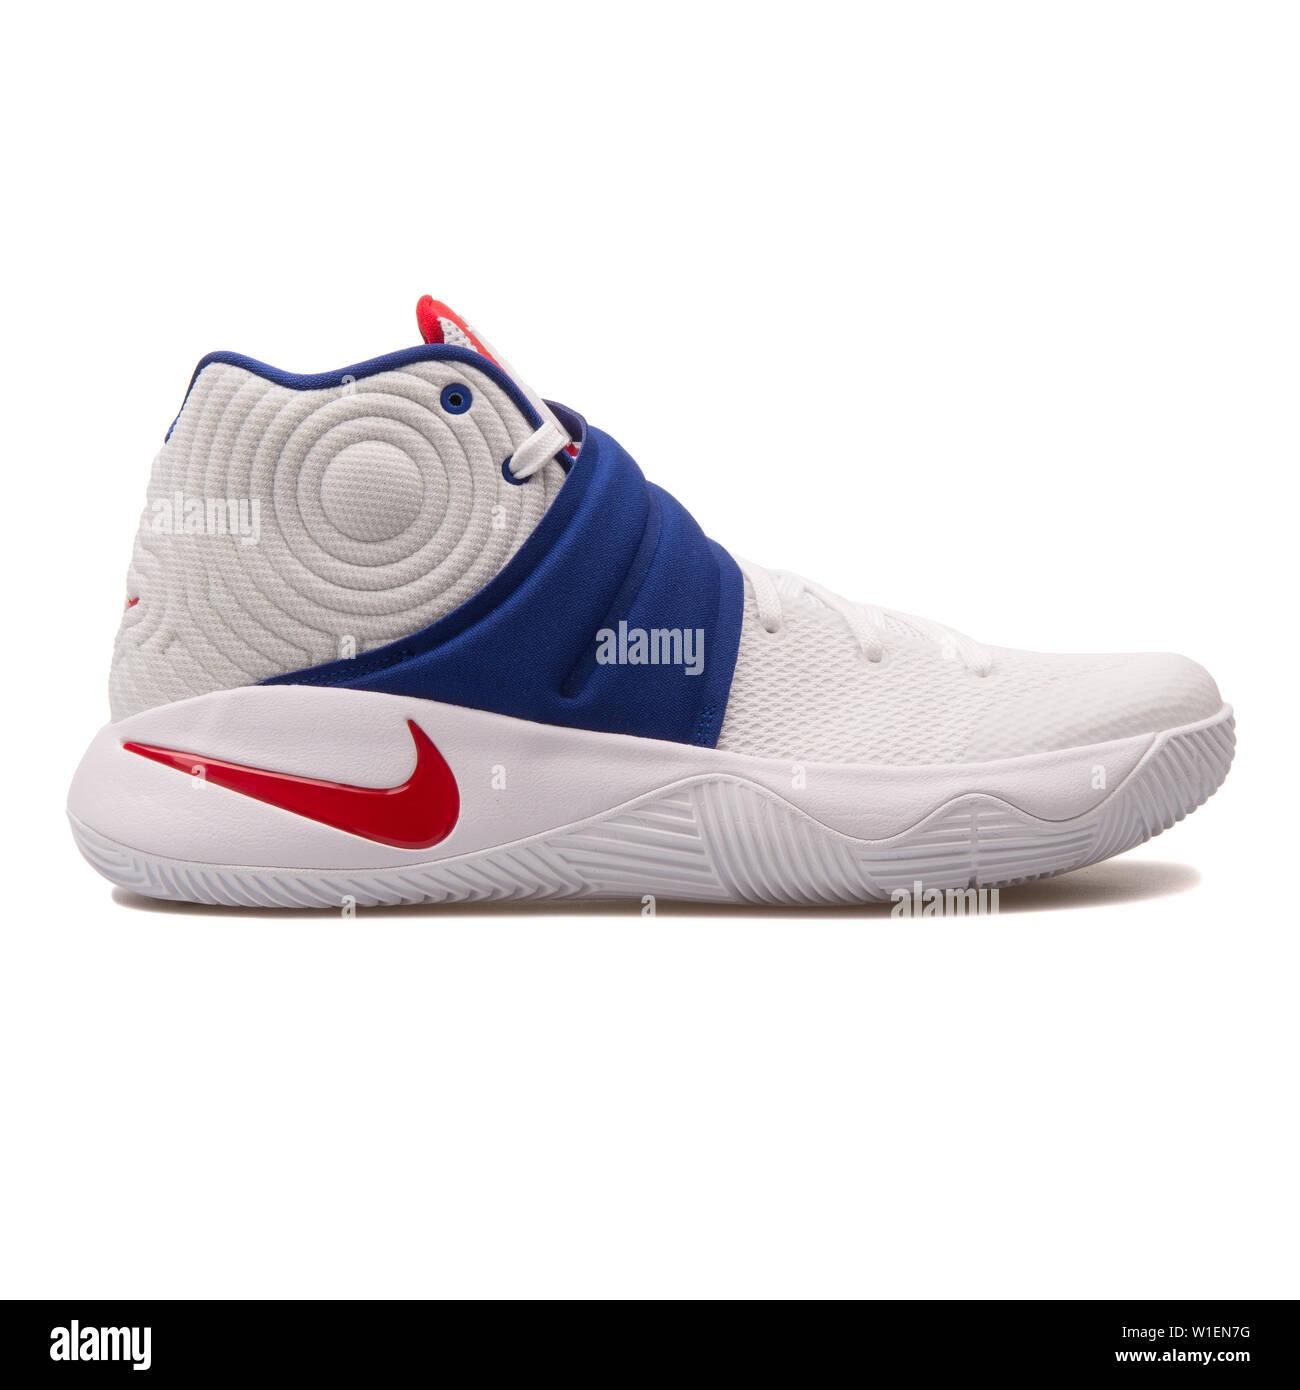 sports shoes be29d 7d2a2 VIENNA, AUSTRIA - AUGUST 30, 2017: Nike Kyrie 2 white, blue ...